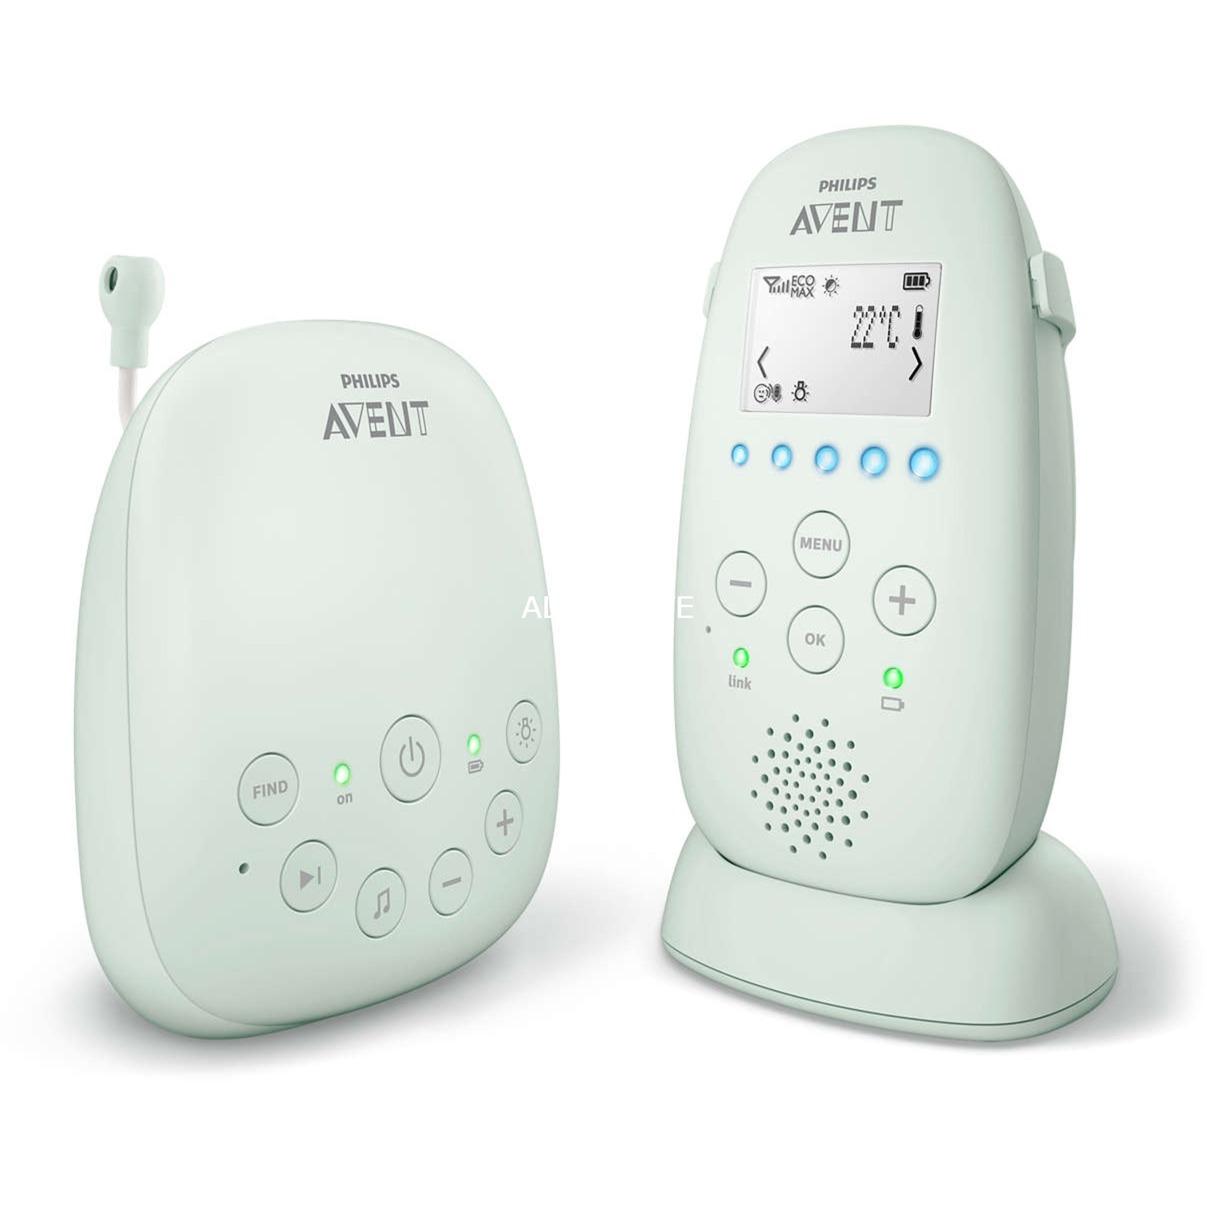 Image of Avent SCD 721/26, Babyphone